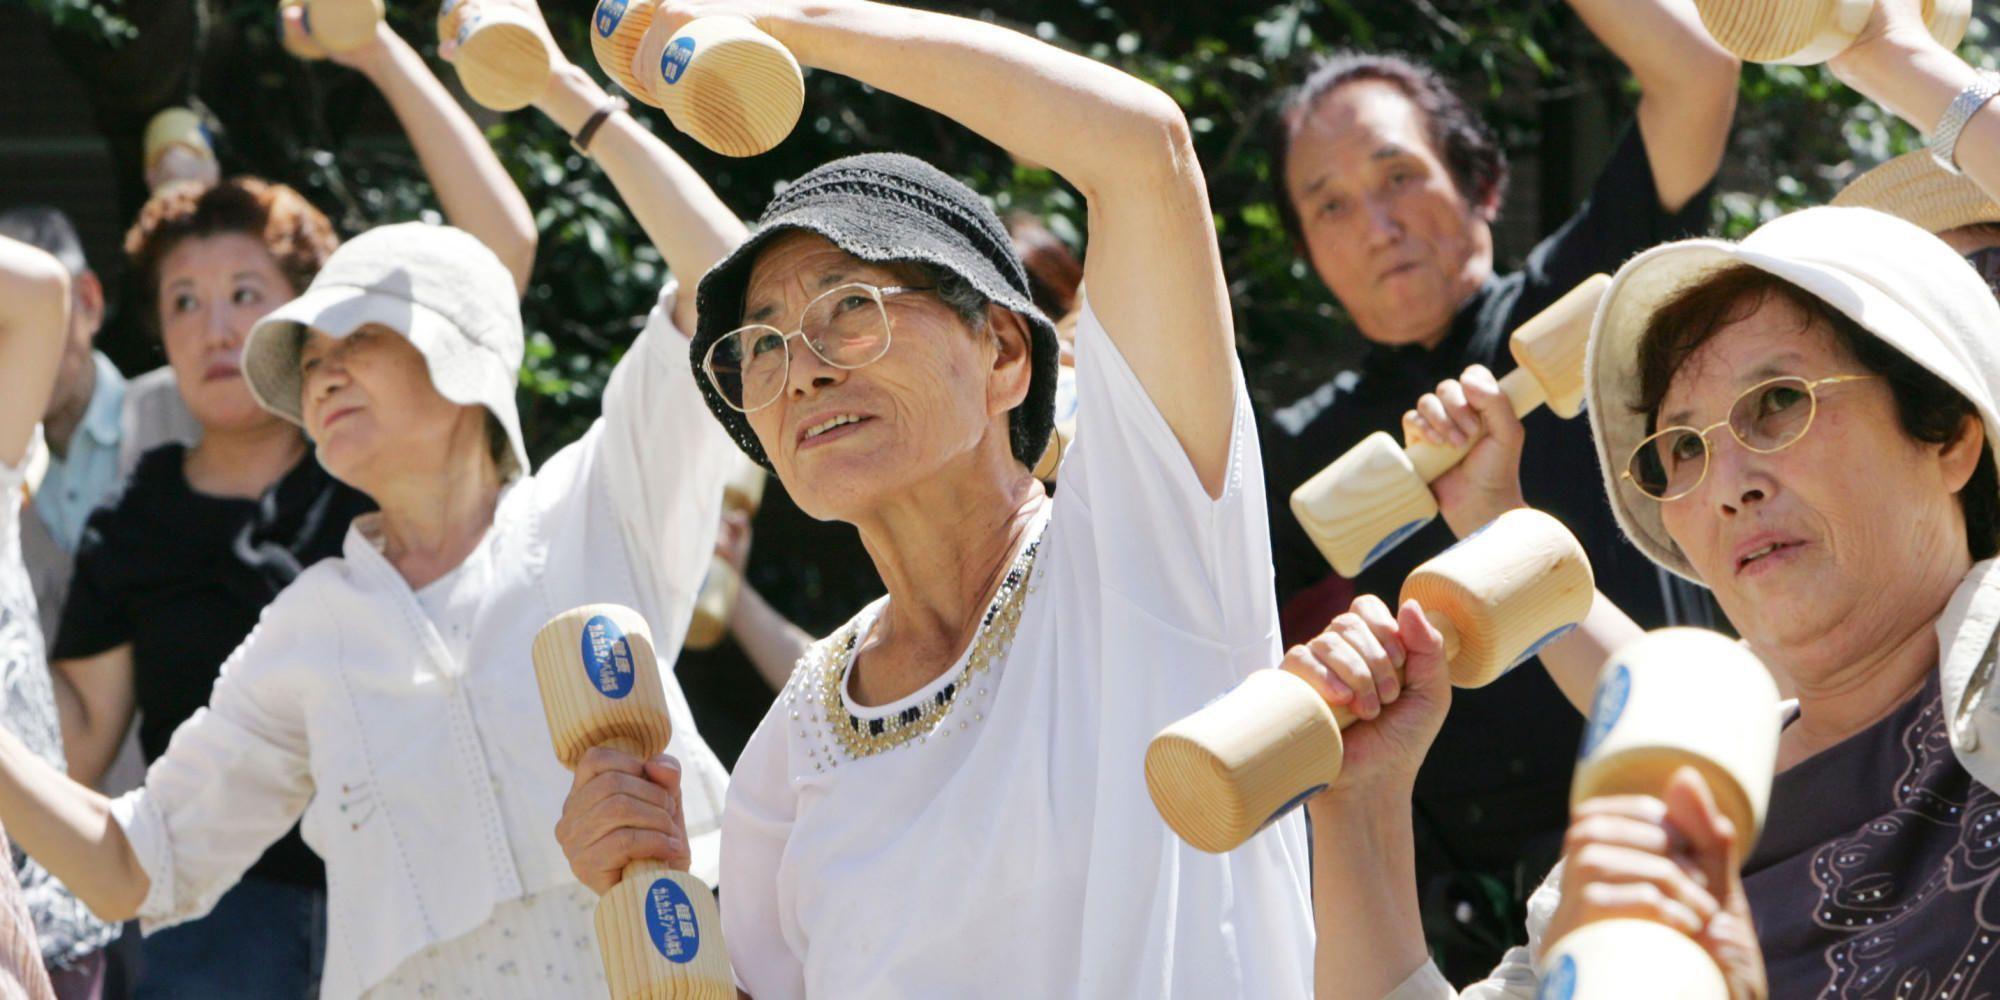 https://www.mononews.gr/wp-content/uploads/2016/05/o-OLDER-PEOPLE-EXERCISING-IN-JAPAN-facebook.jpg